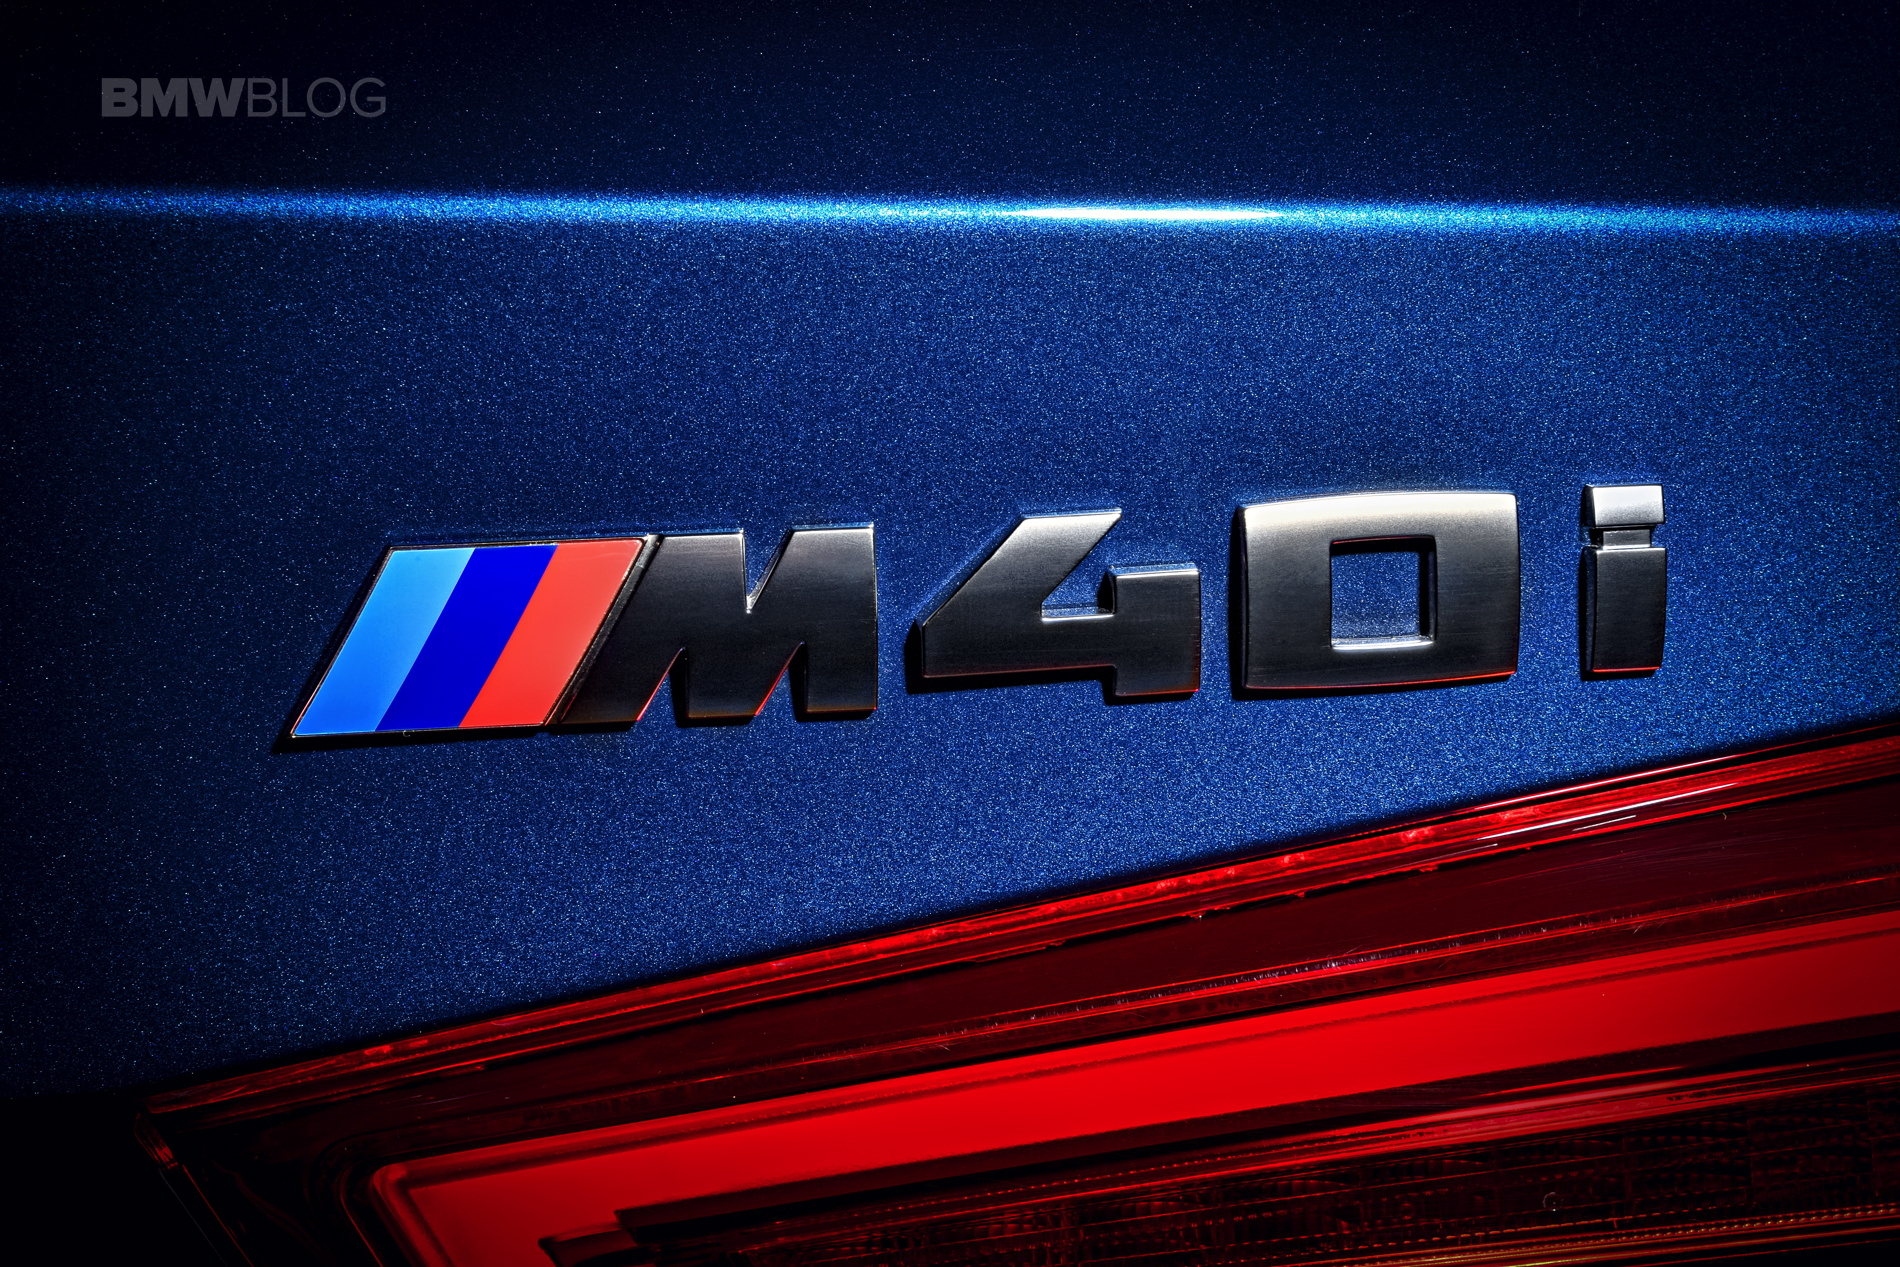 2018 BMW X3 G01 official photos 34